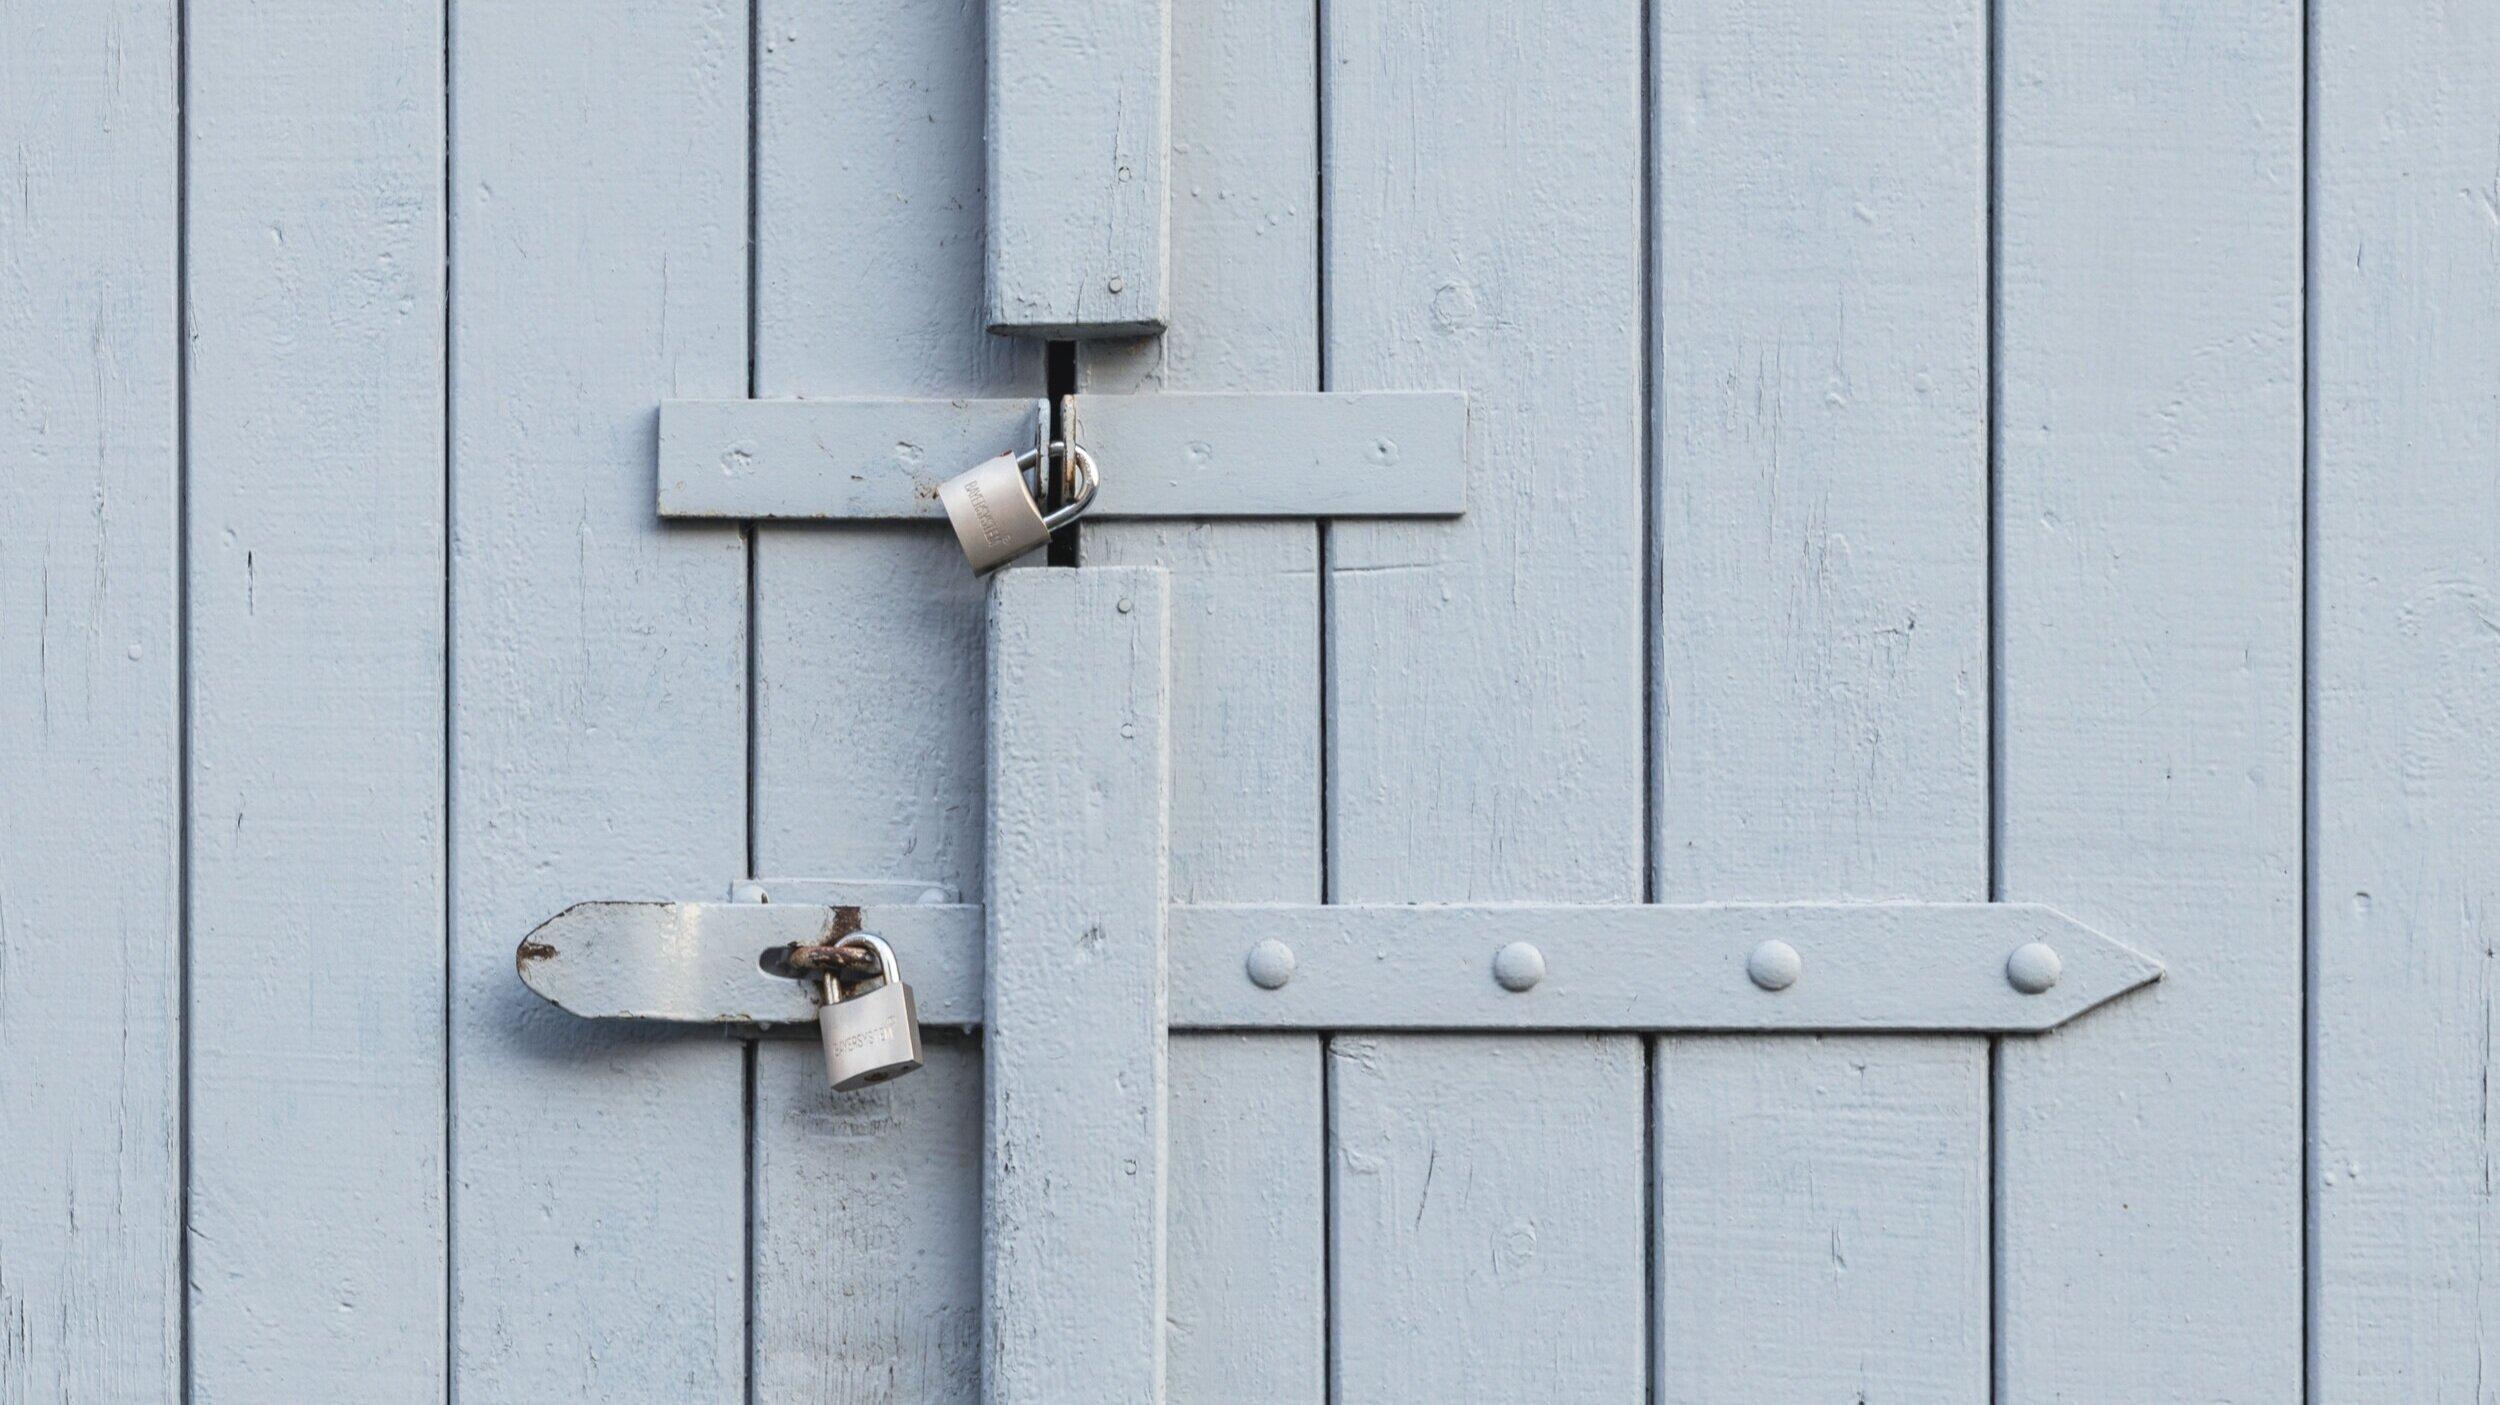 SSL certification secures your website